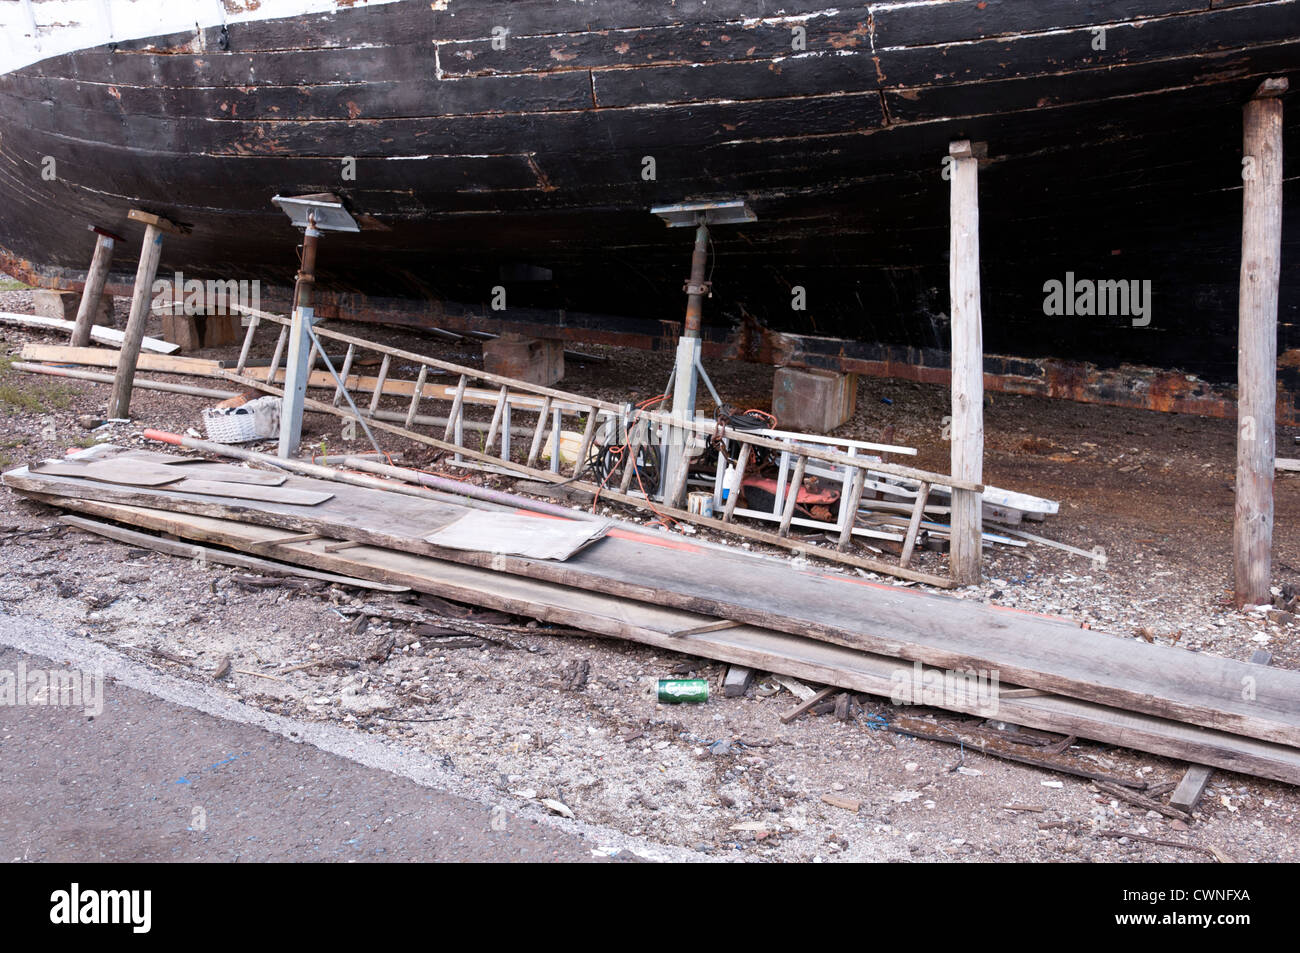 Wooden boat in dry dock undergoing restoration. - Stock Image